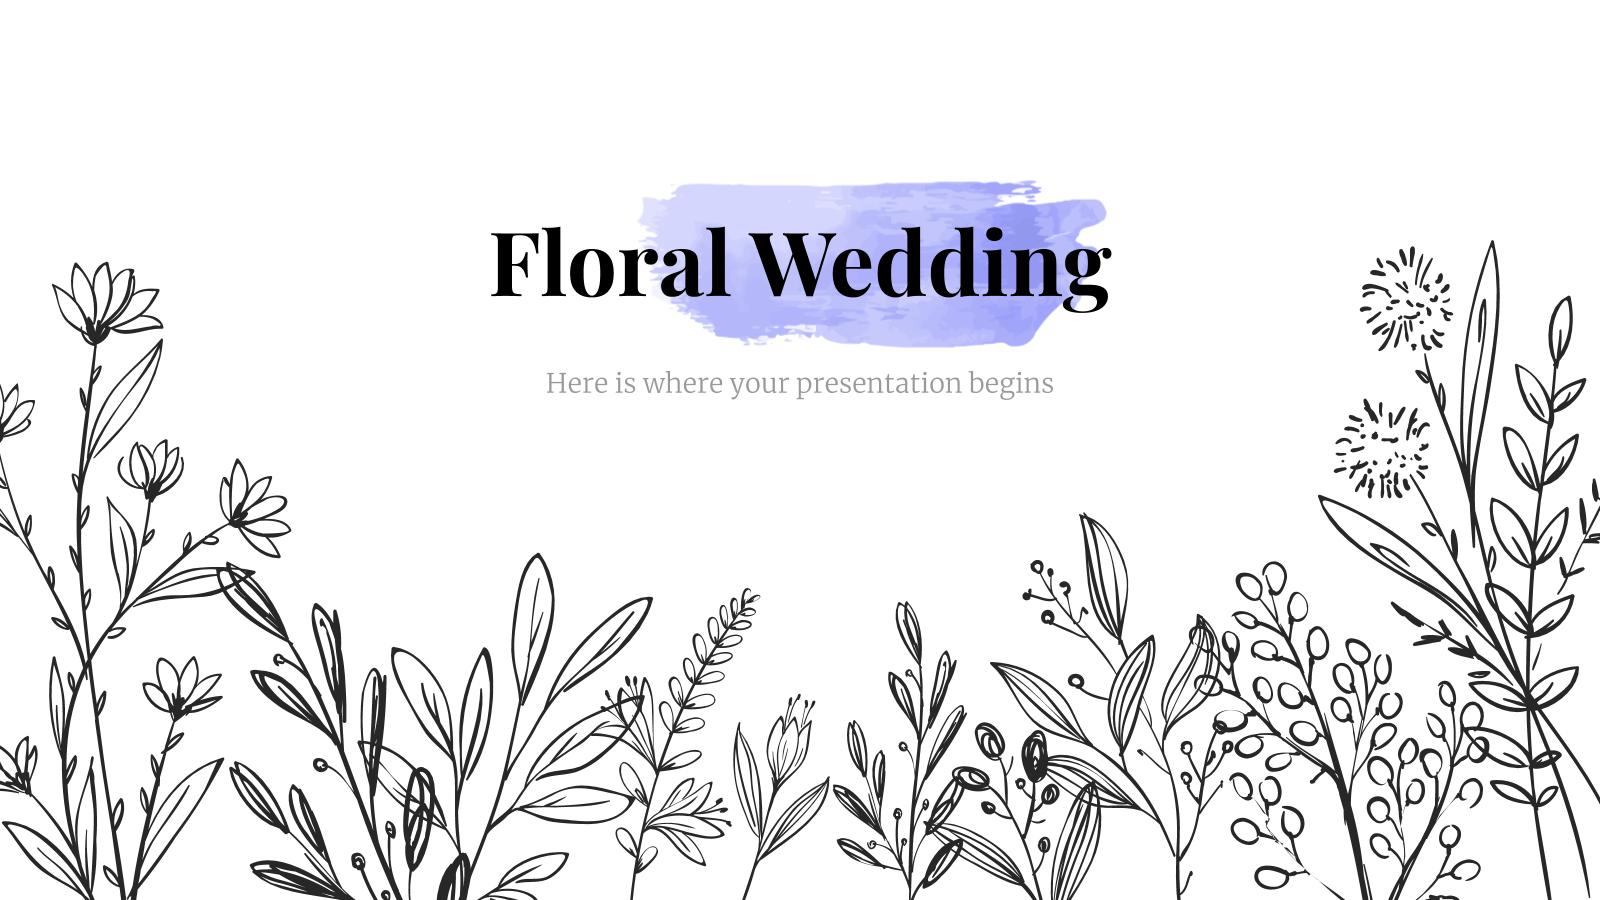 Floral Wedding presentation template